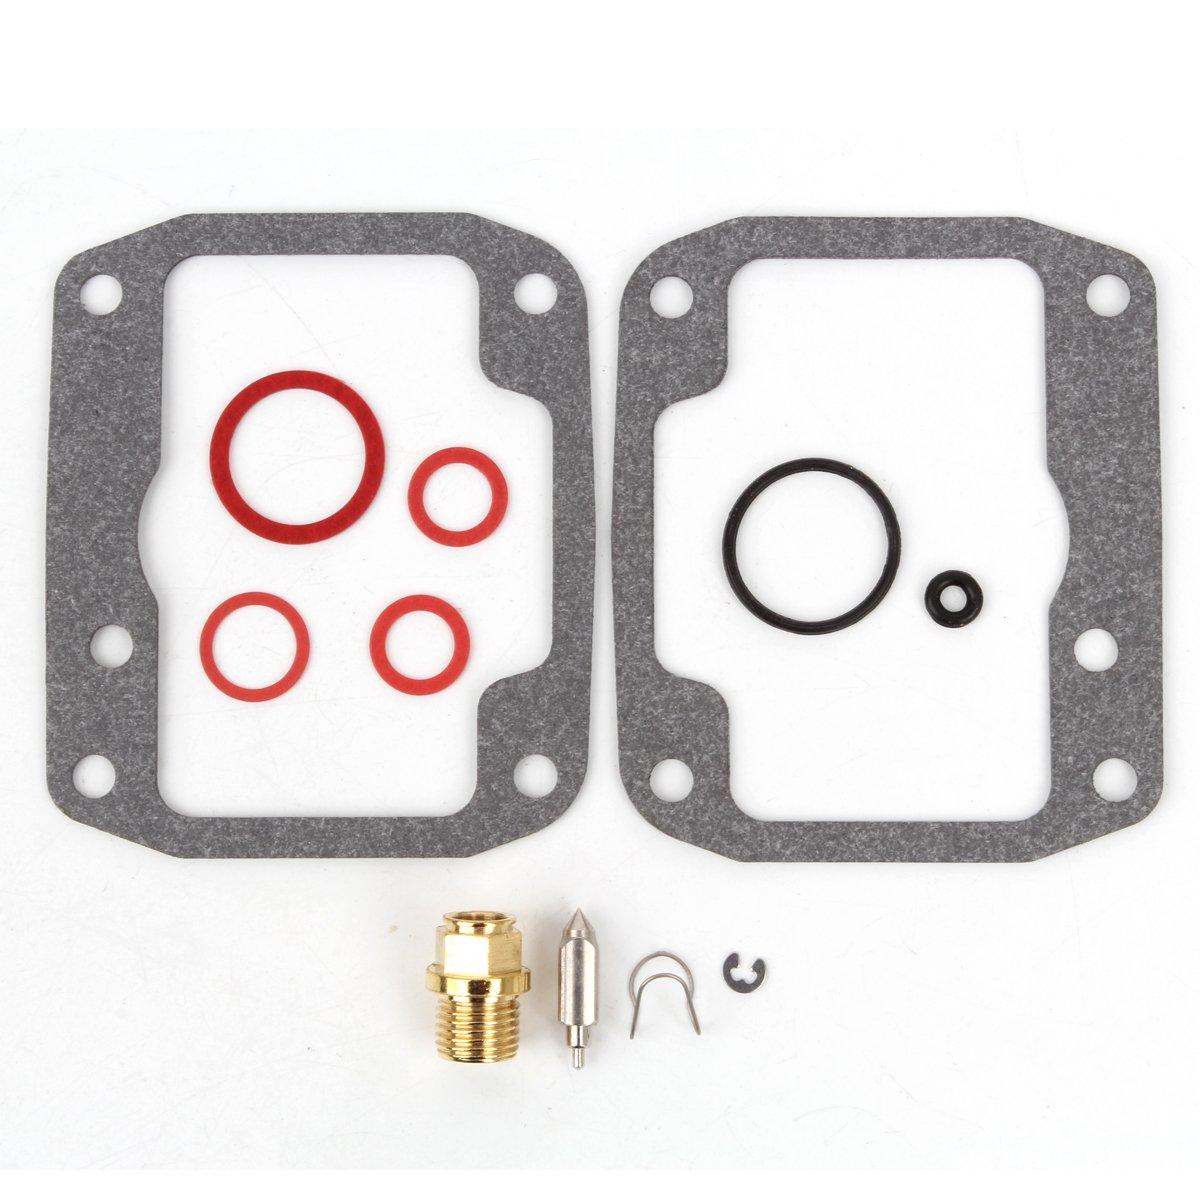 Cheap Mikuni Carb Kits Rebuild, find Mikuni Carb Kits